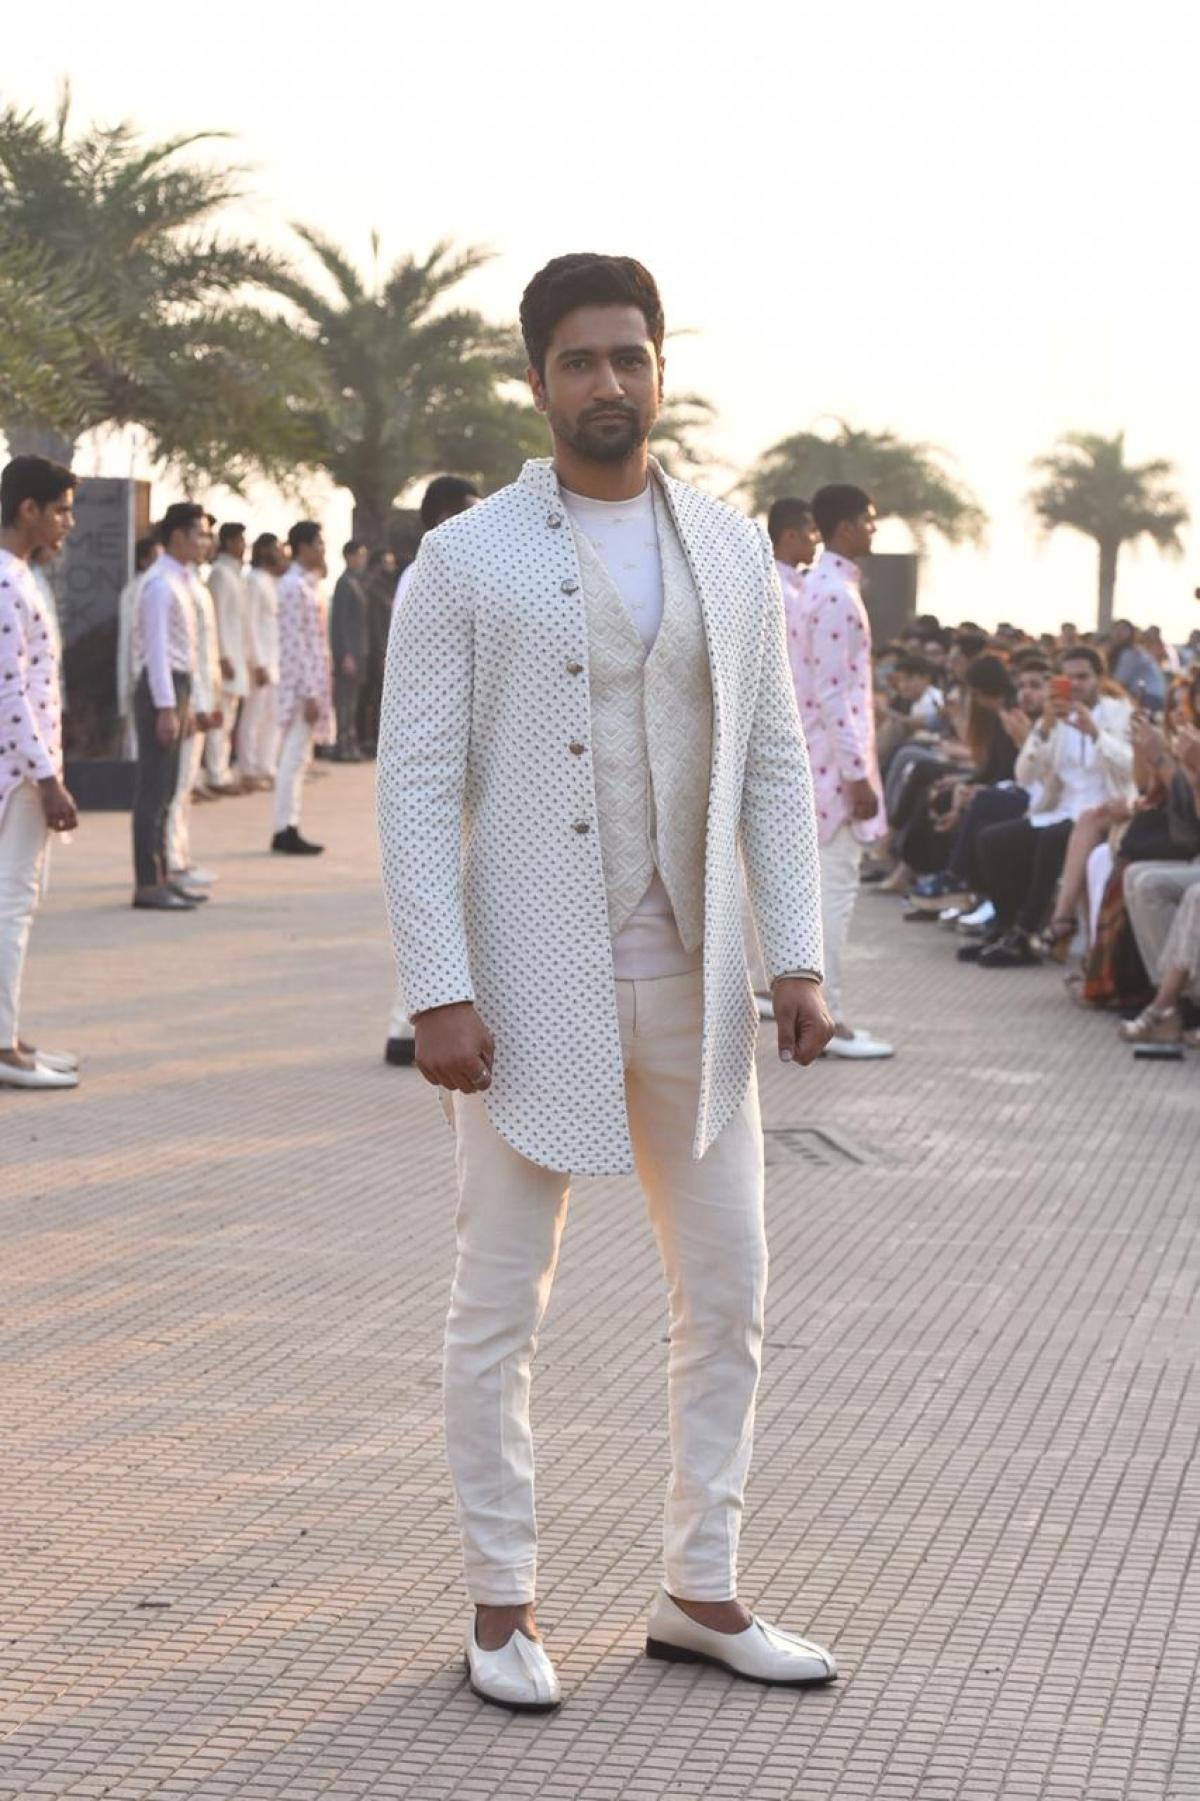 LFW 2020: Vicky Kaushal walks for Kunal Rawal's special show at Mumbai's Bandra-Worli Sea link promenade